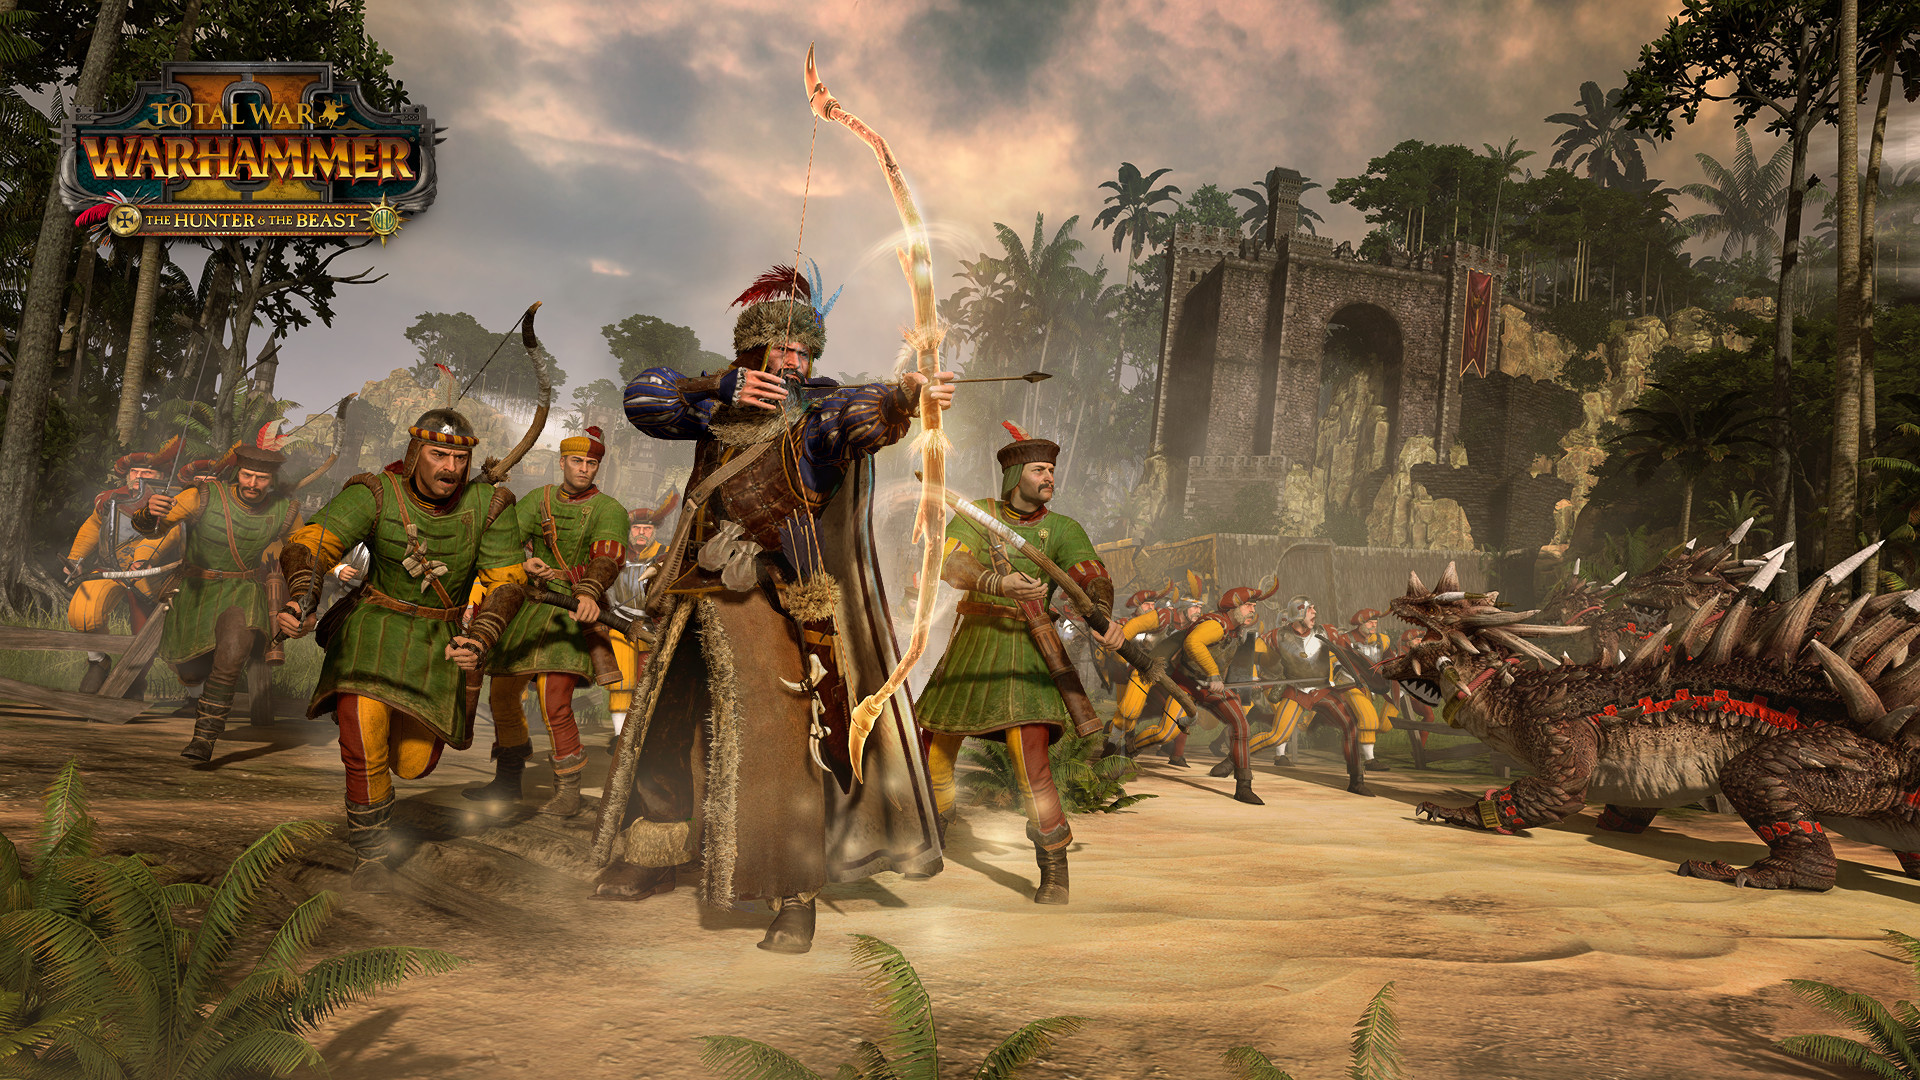 Total War: WARHAMMER II - The Hunter & The Beast PC Key Fiyatları